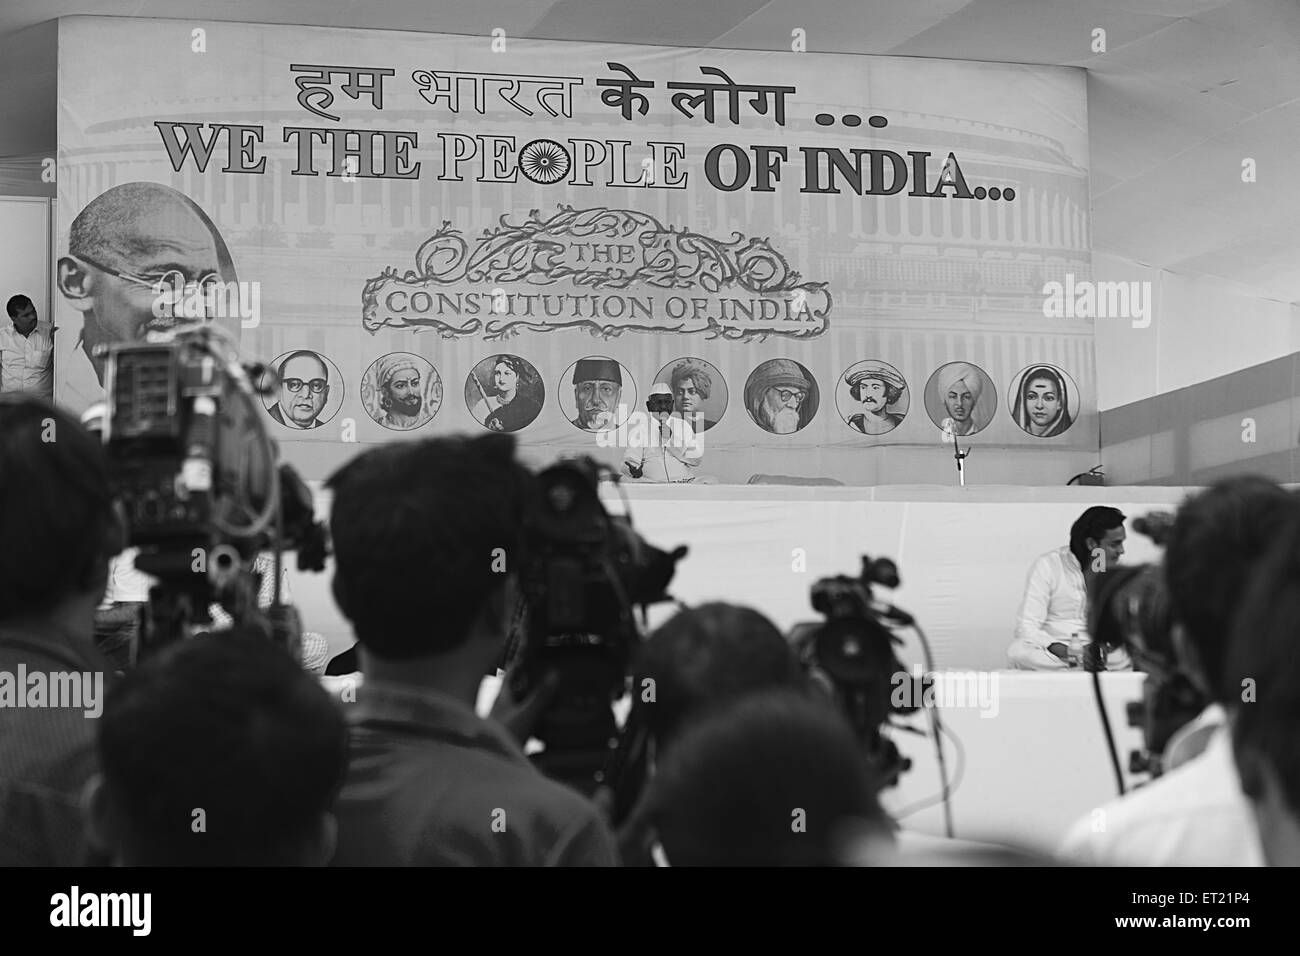 Video Camera Coverage Anna Hazare Mumbai Maharashtra India Asia Dec 2011 - Stock Image